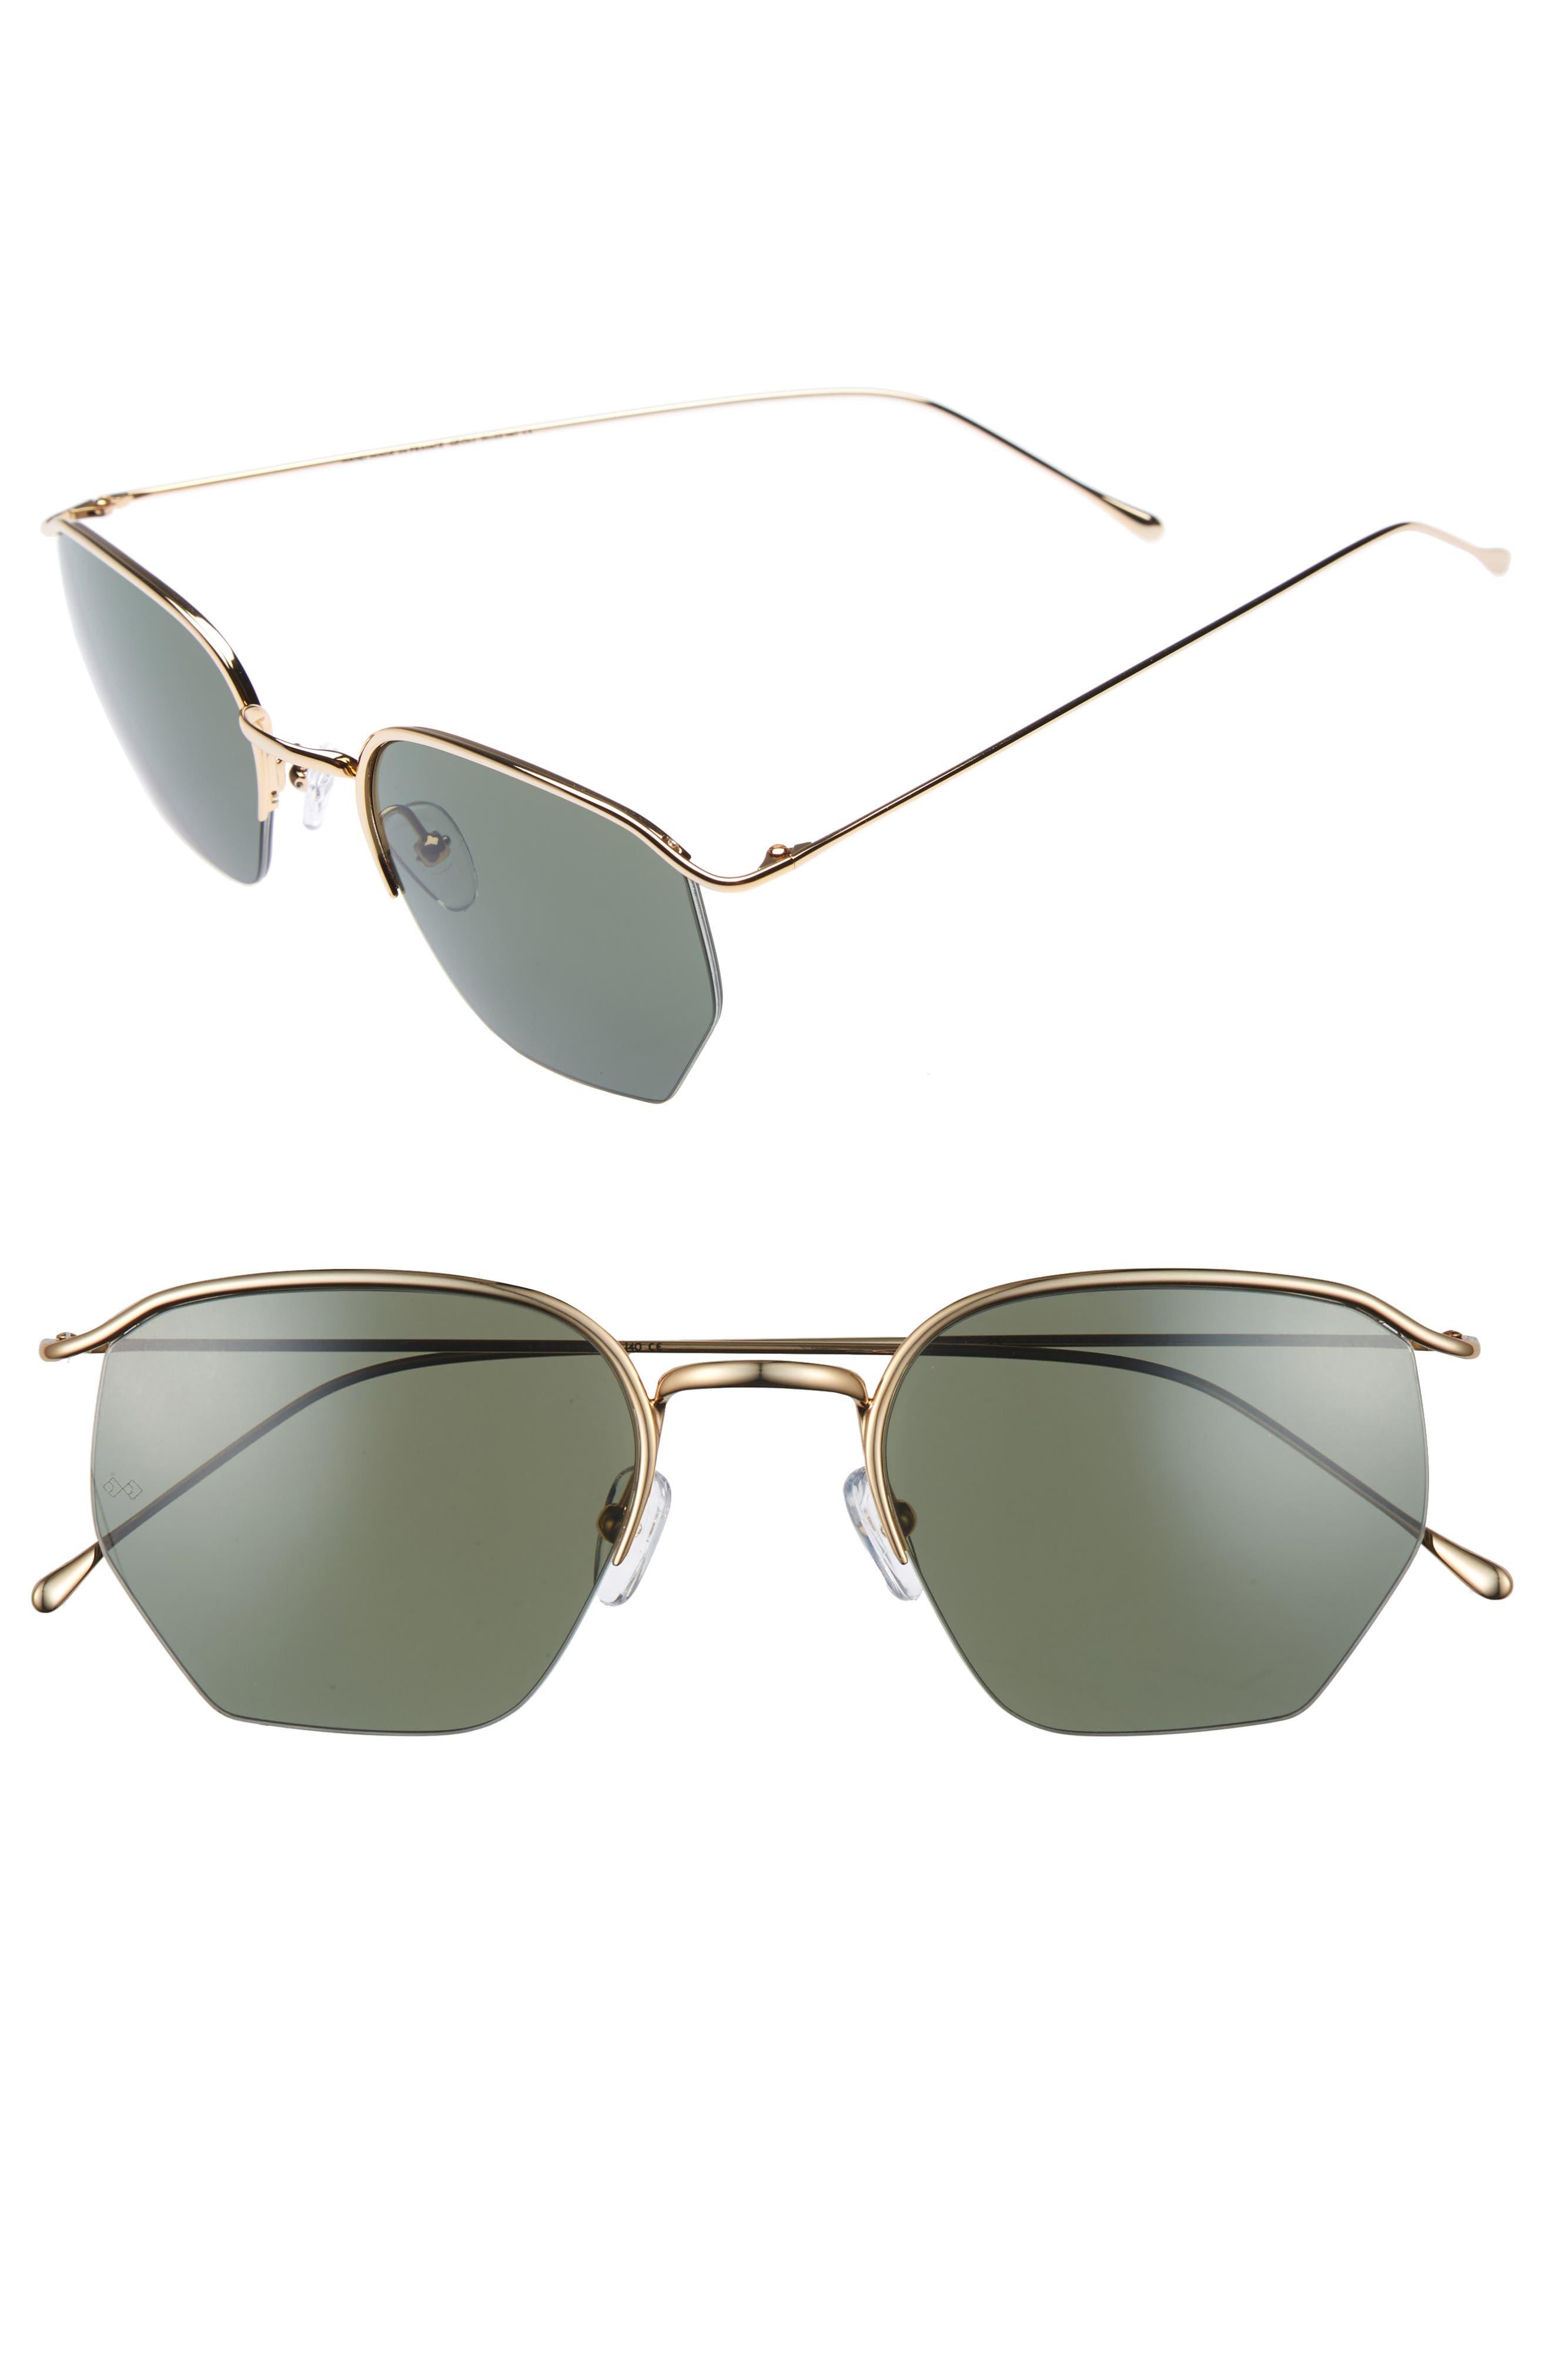 Geo 1 50mm Aviator Sunglasses,                         Main,                         color, Gold/ Light Green